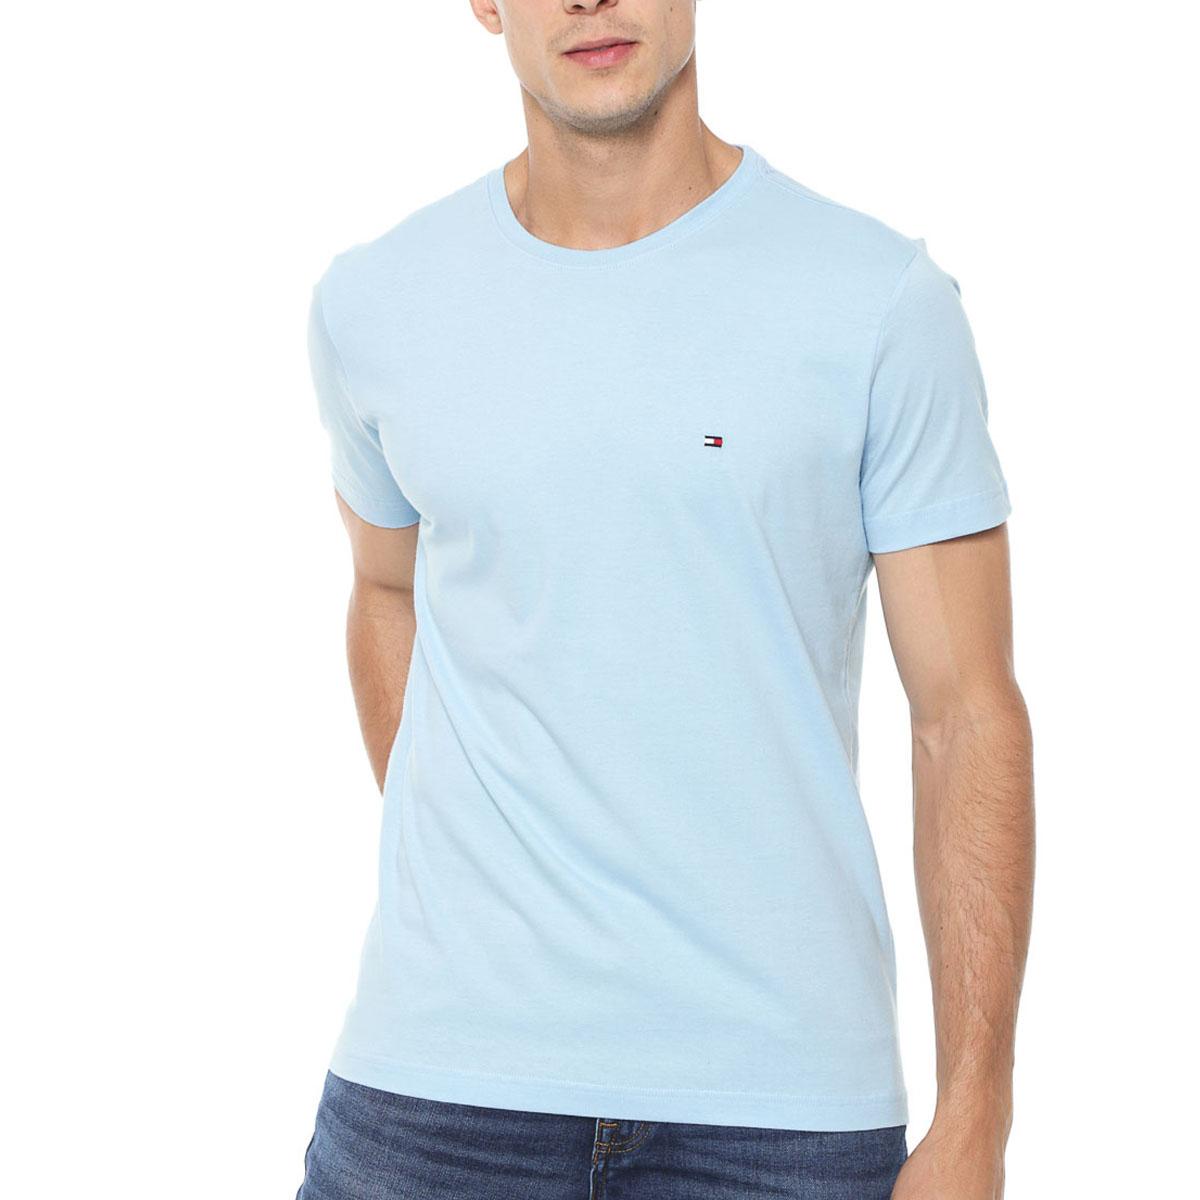 Camiseta Tommy Hilfiger Regular Essential Azul Claro